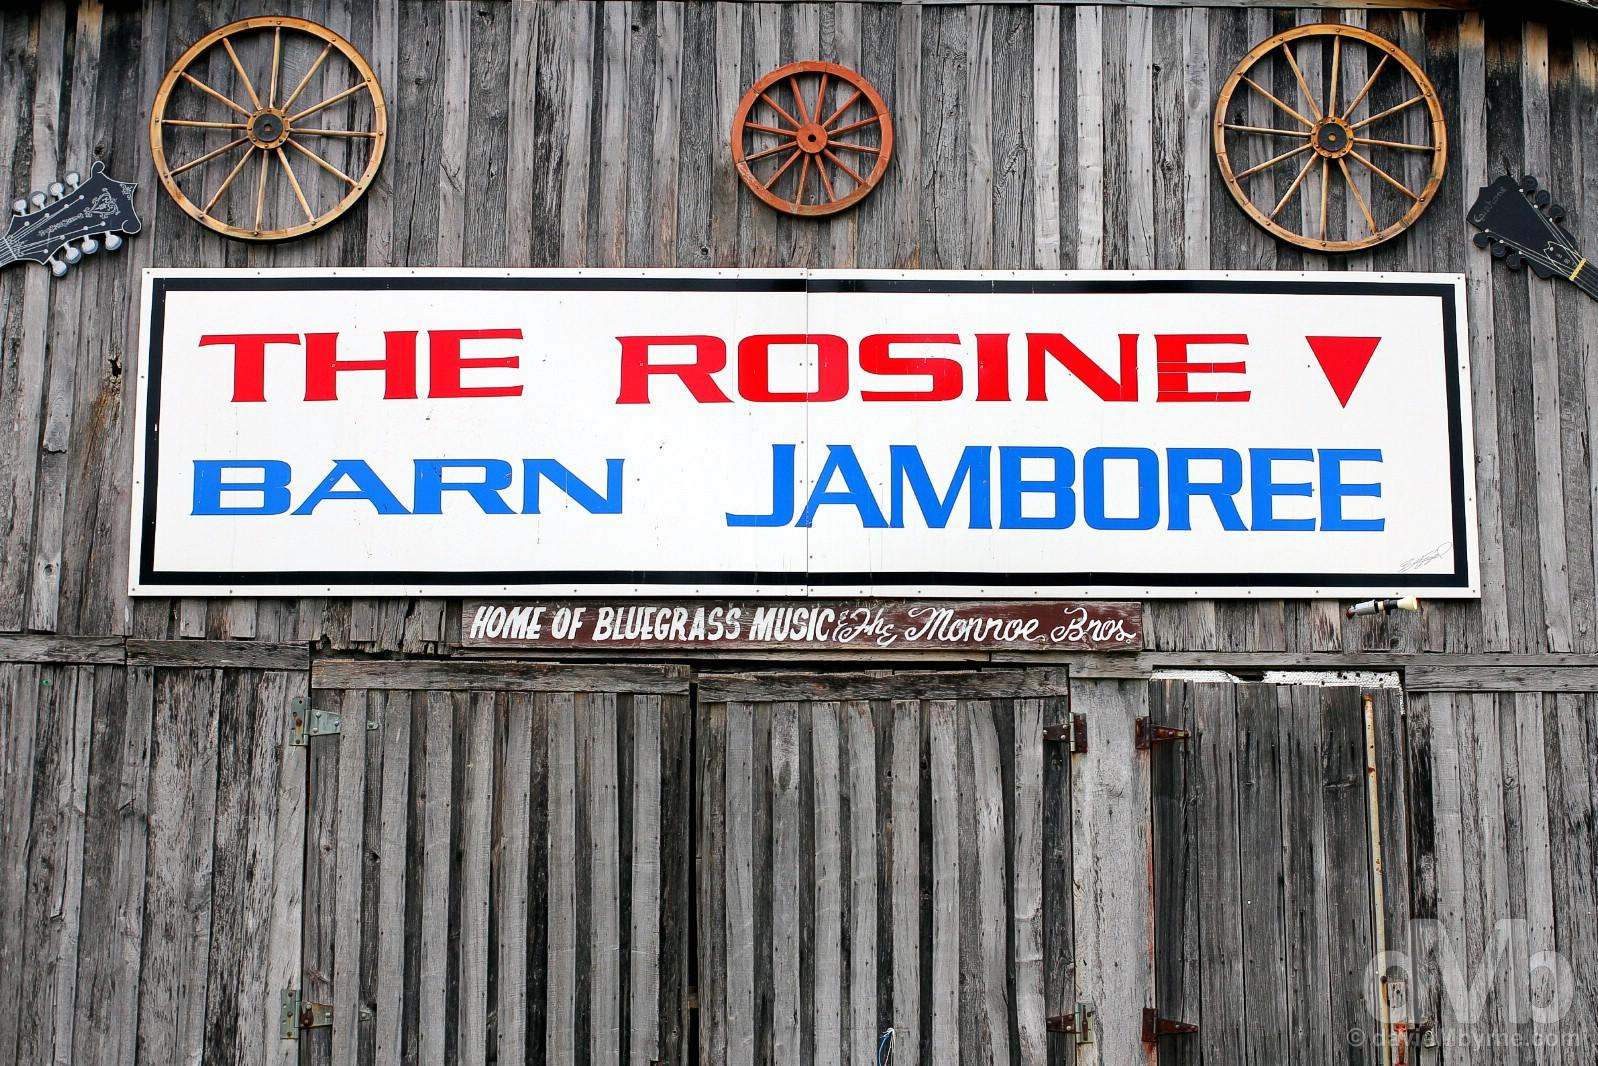 The Barn Jamboree in Rosine, Ohio County, Kentucky, USA. September 28, 2016.